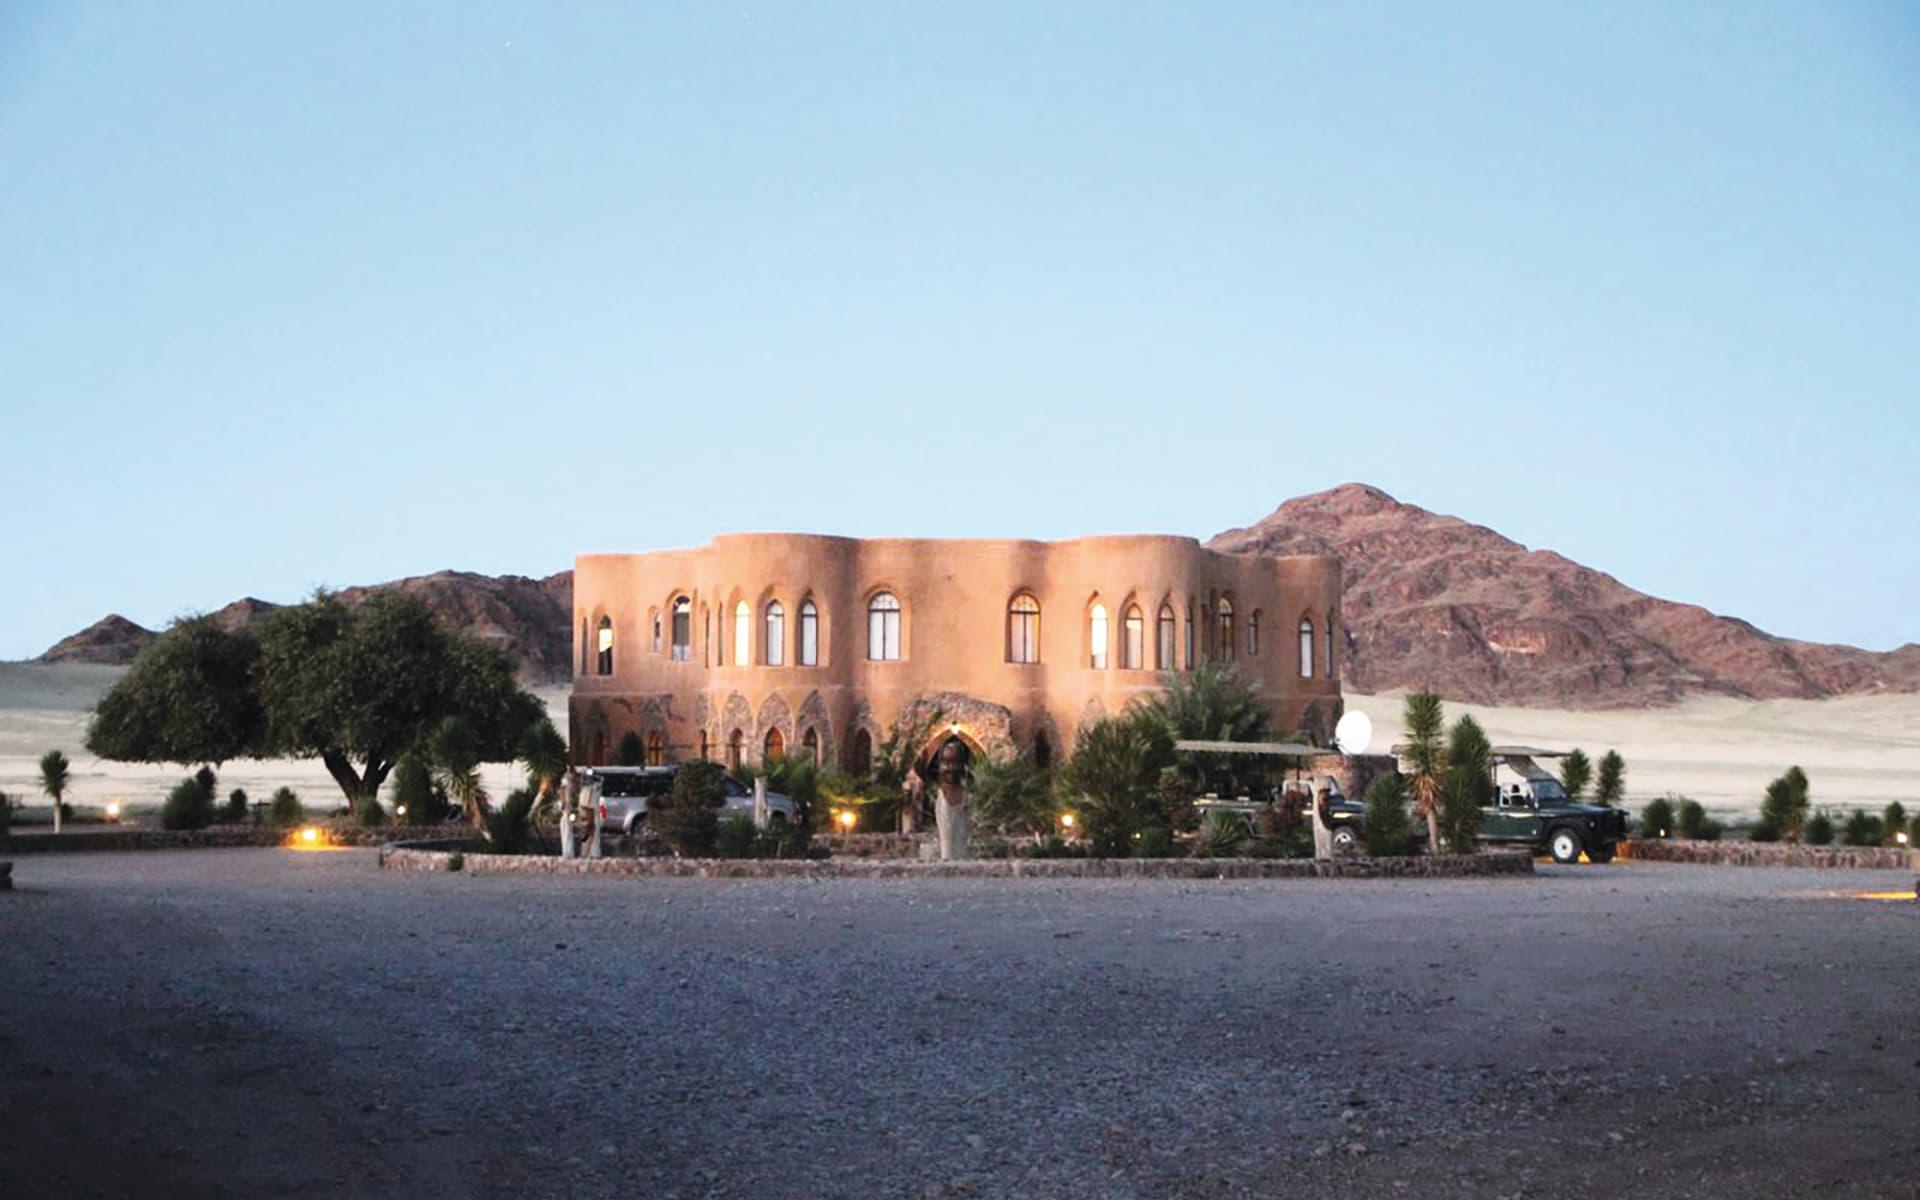 Le Mirage Resort & Spa in Sesriem: Exterior Le Mirage Desert Lodge & Spa Aussenansicht